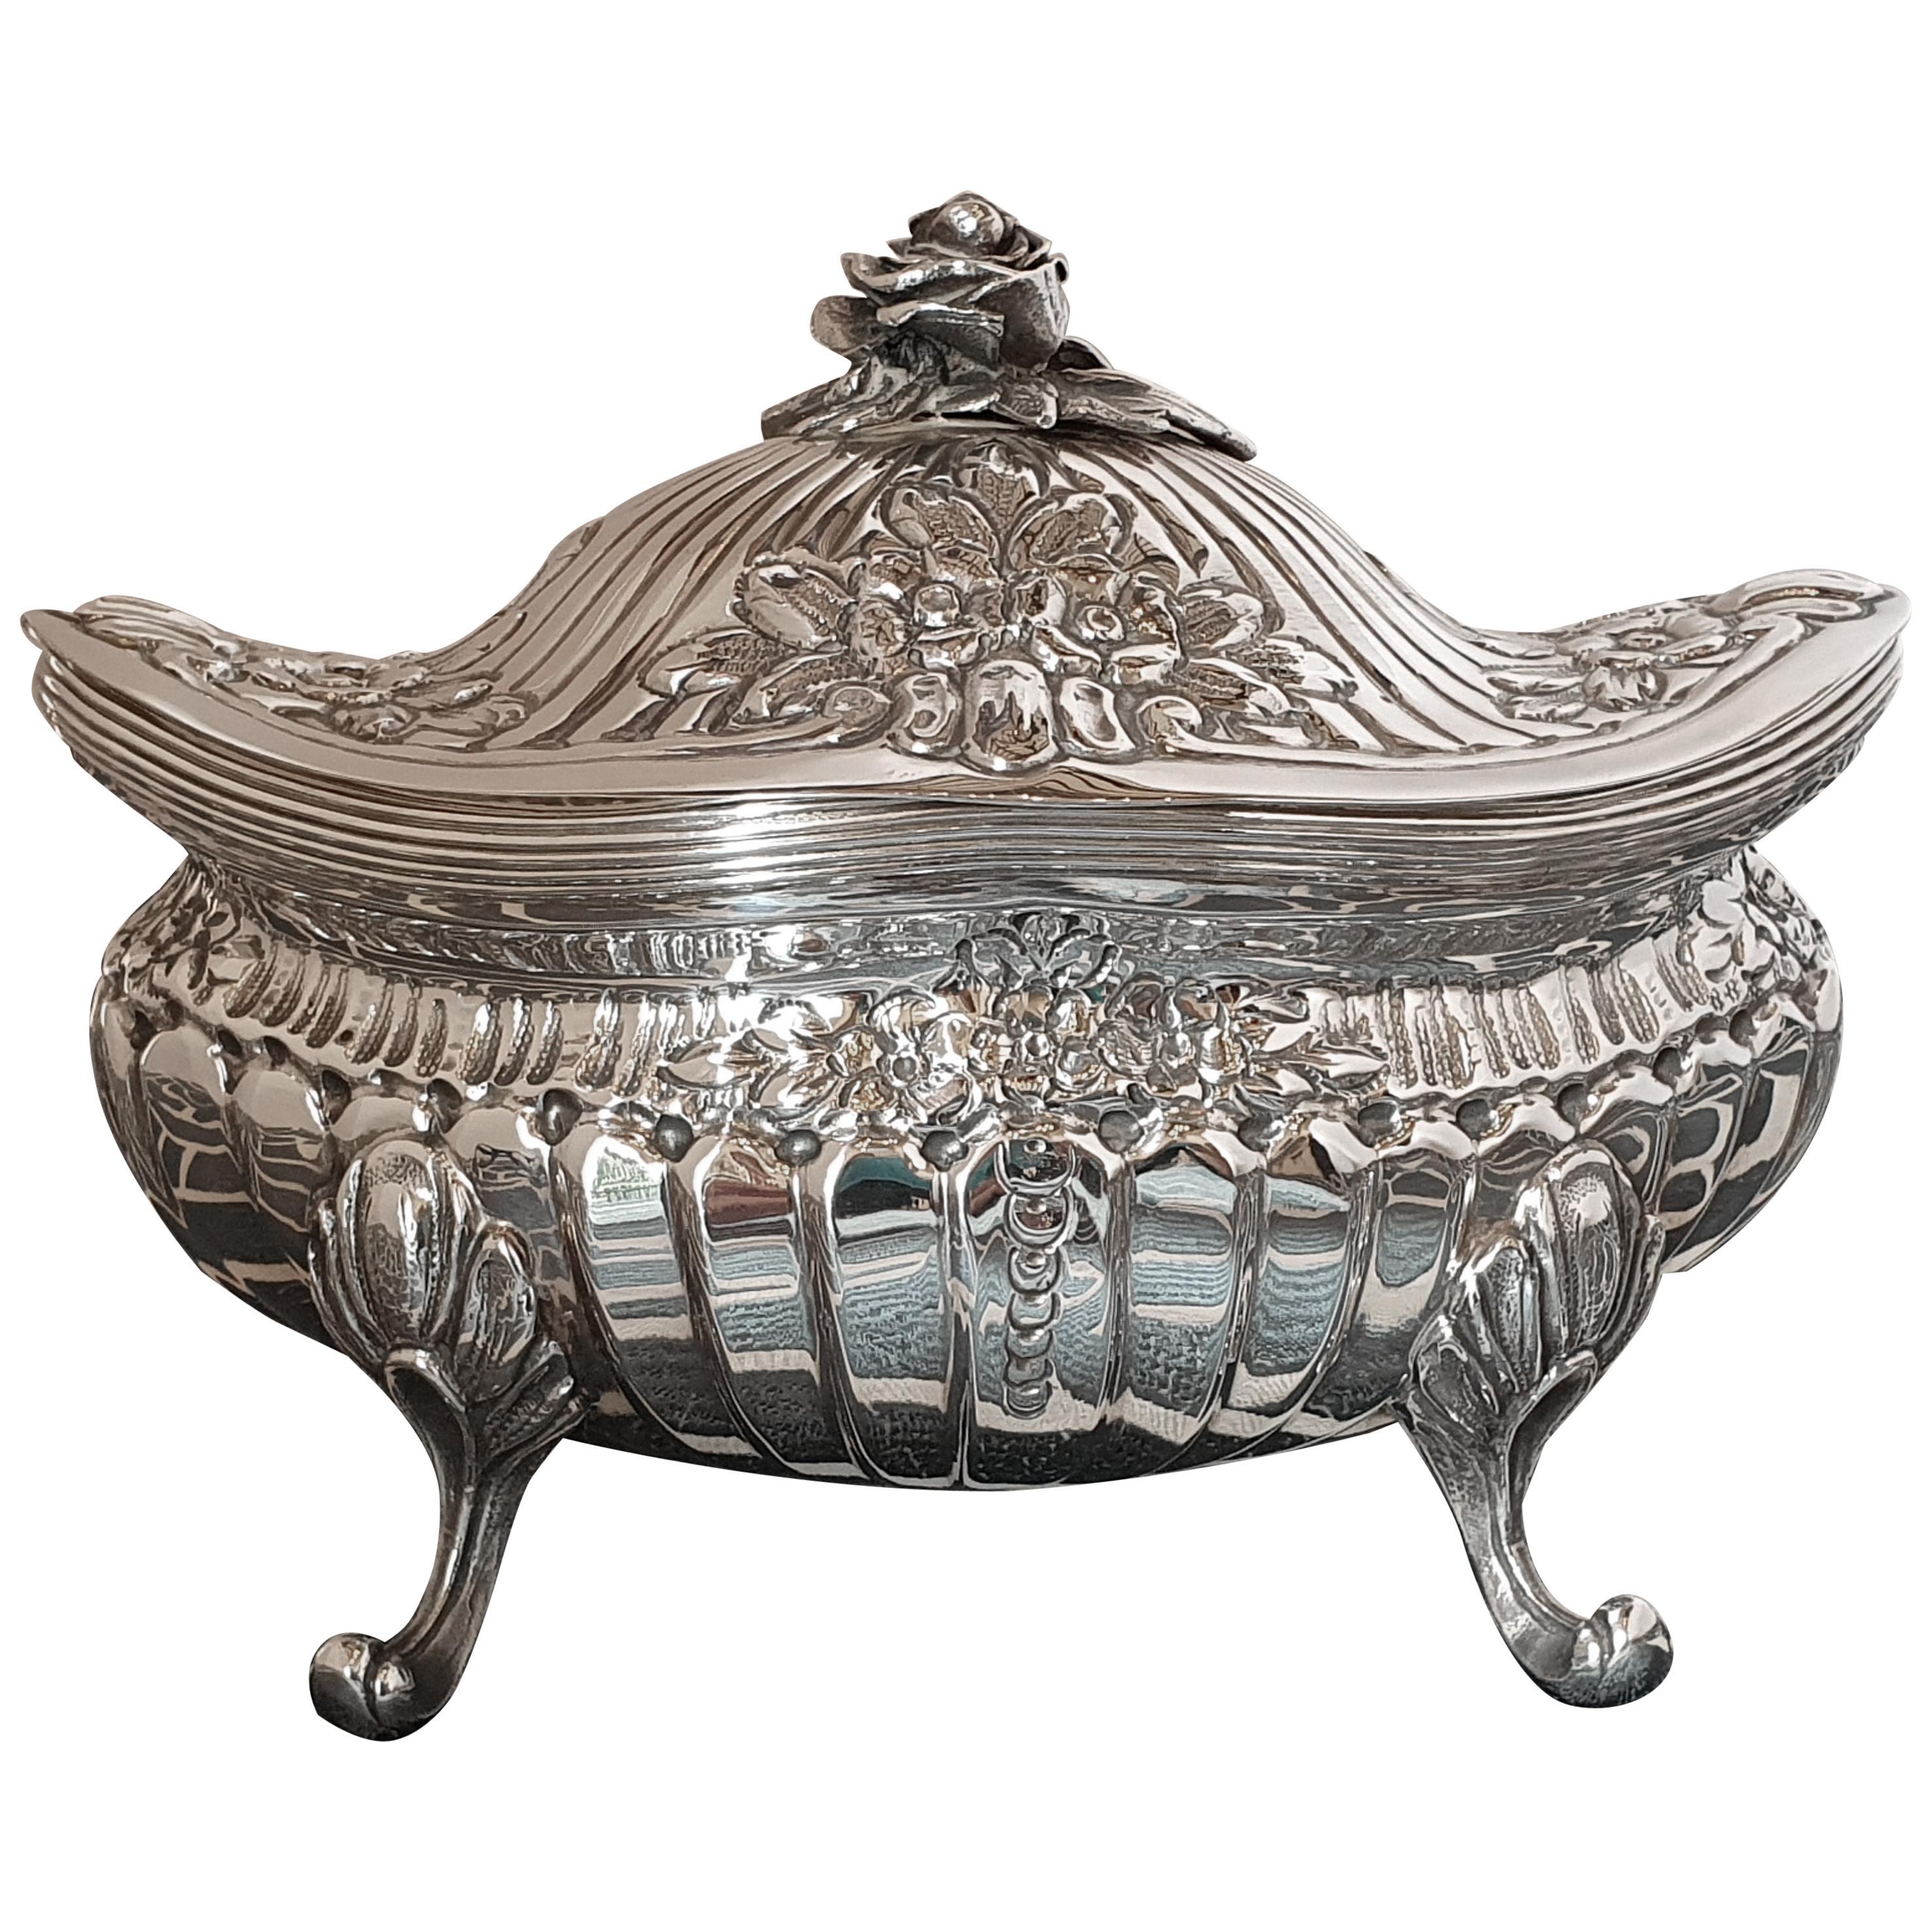 21st Century Rococo Style Sterling Silver Sugar Box, Italy, 2005